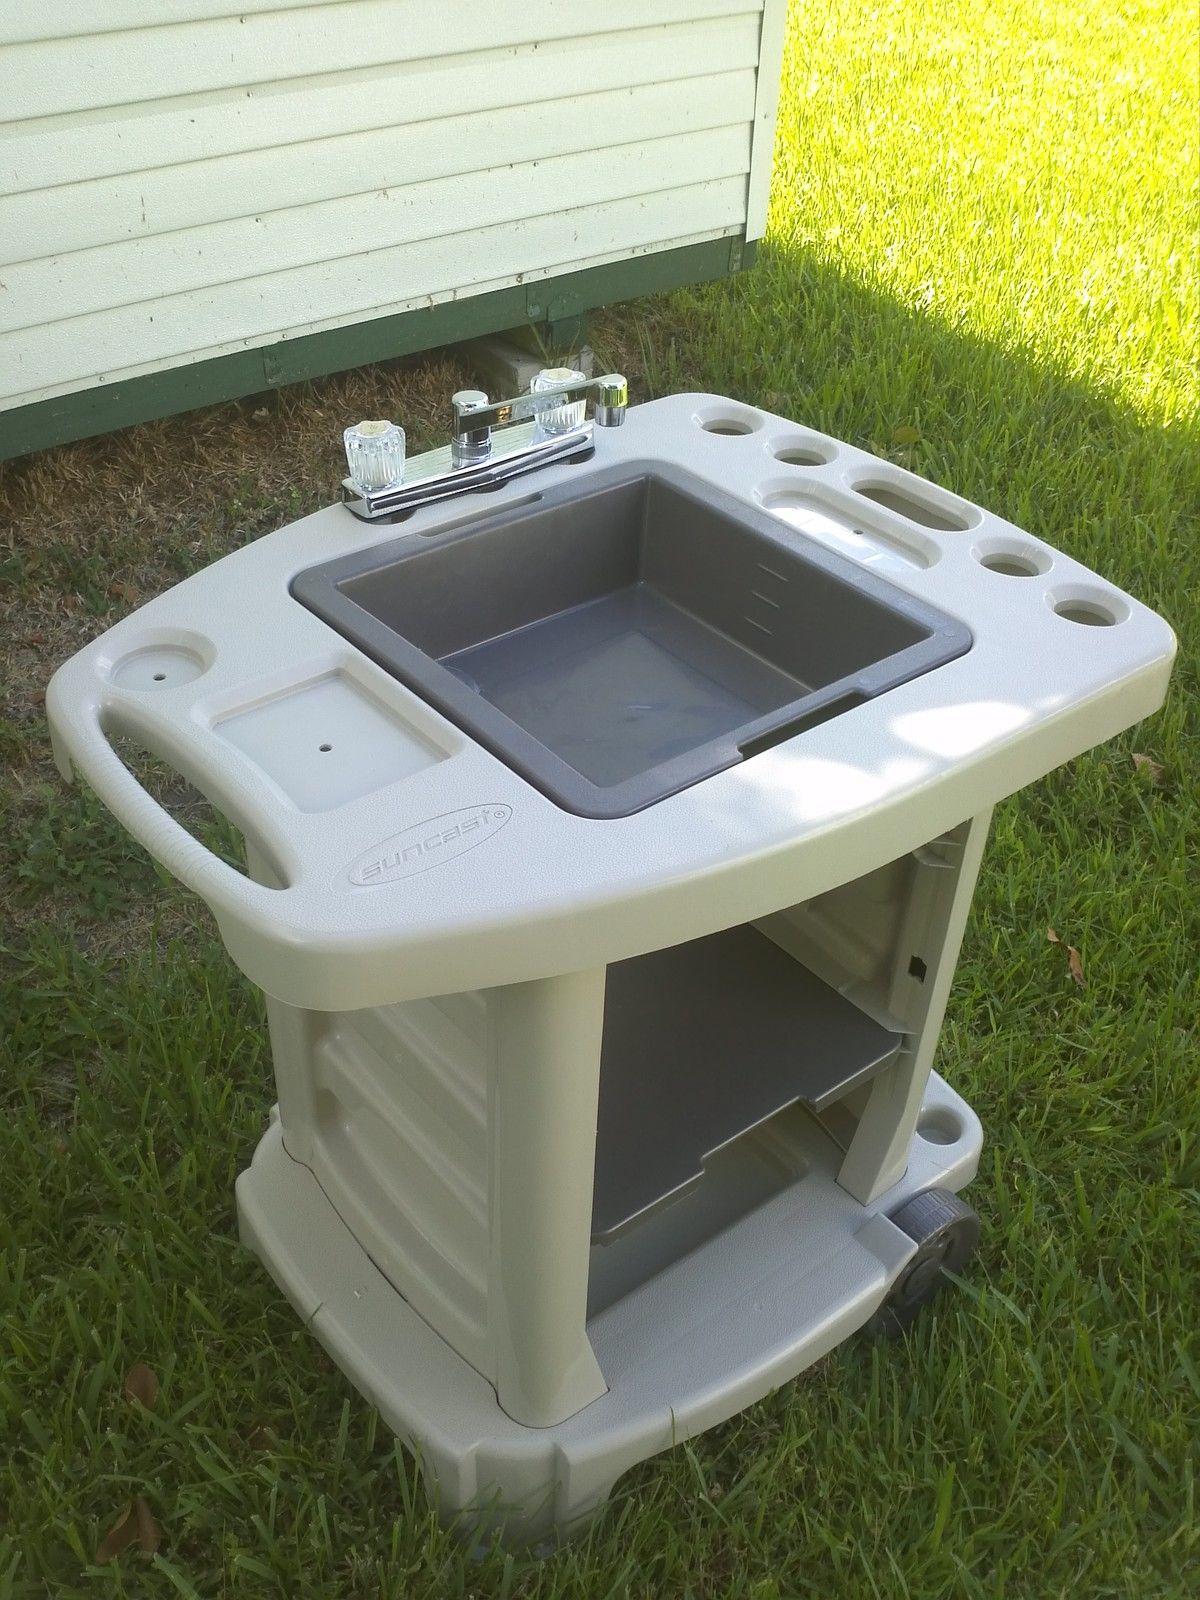 Portable kitchen sink Photo - 5